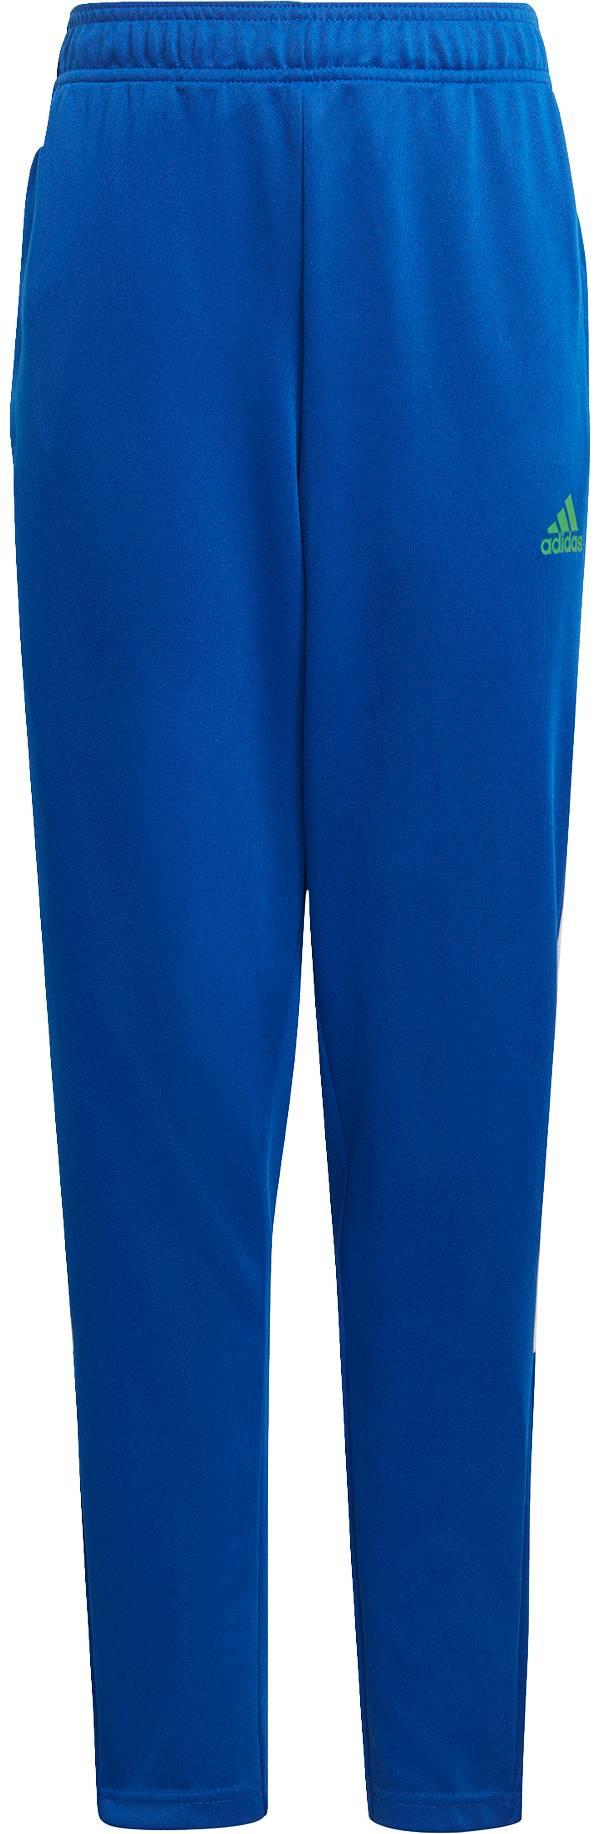 adidas Boys' Tiro Faiding Pants product image